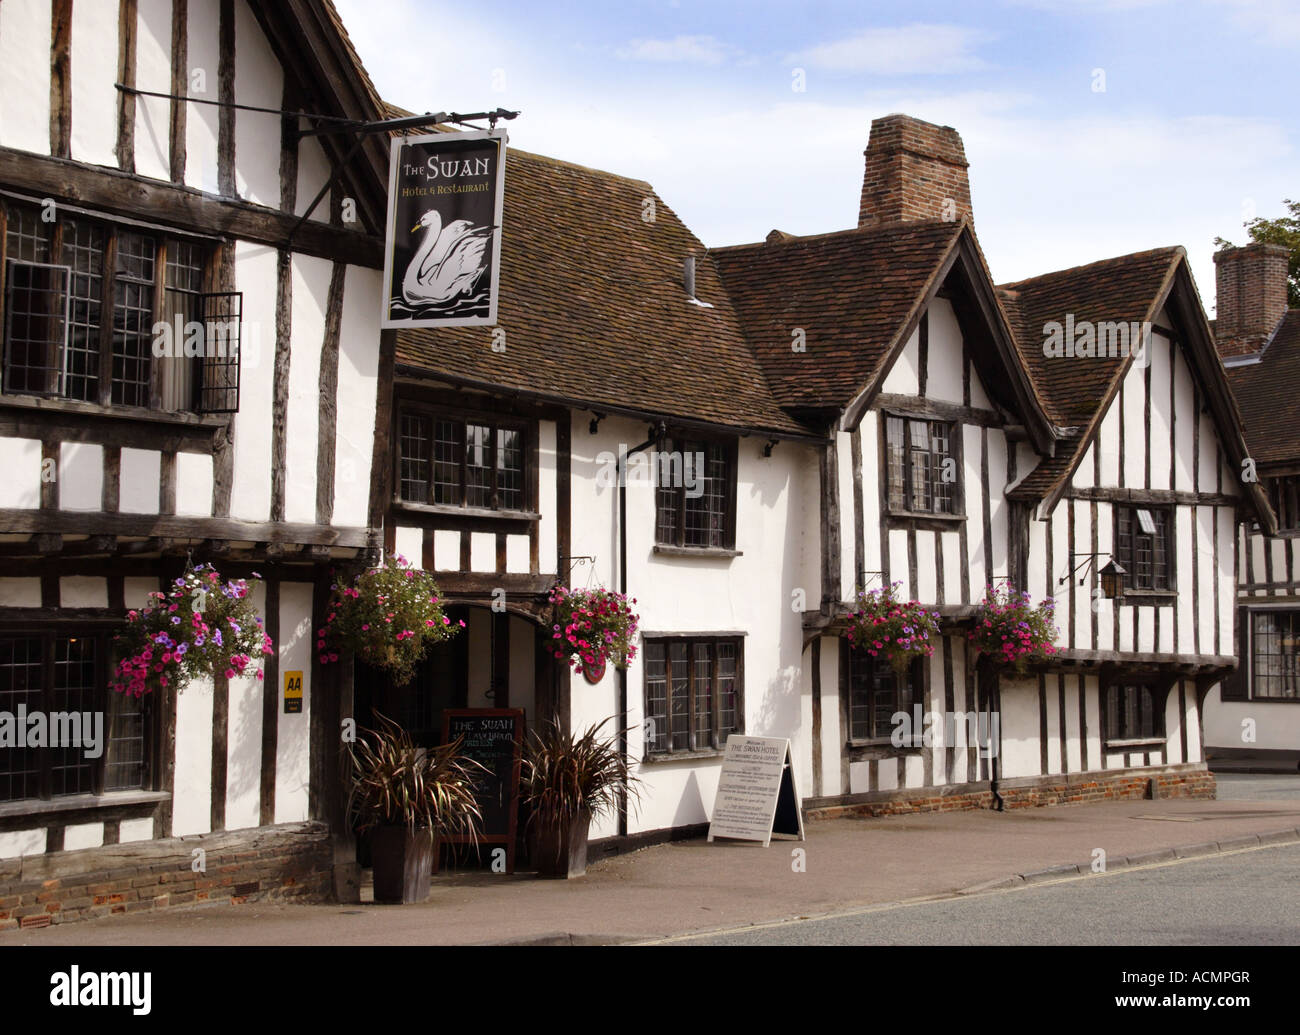 Swan Hotel, Lavenham, Suffolk, England - Stock Image